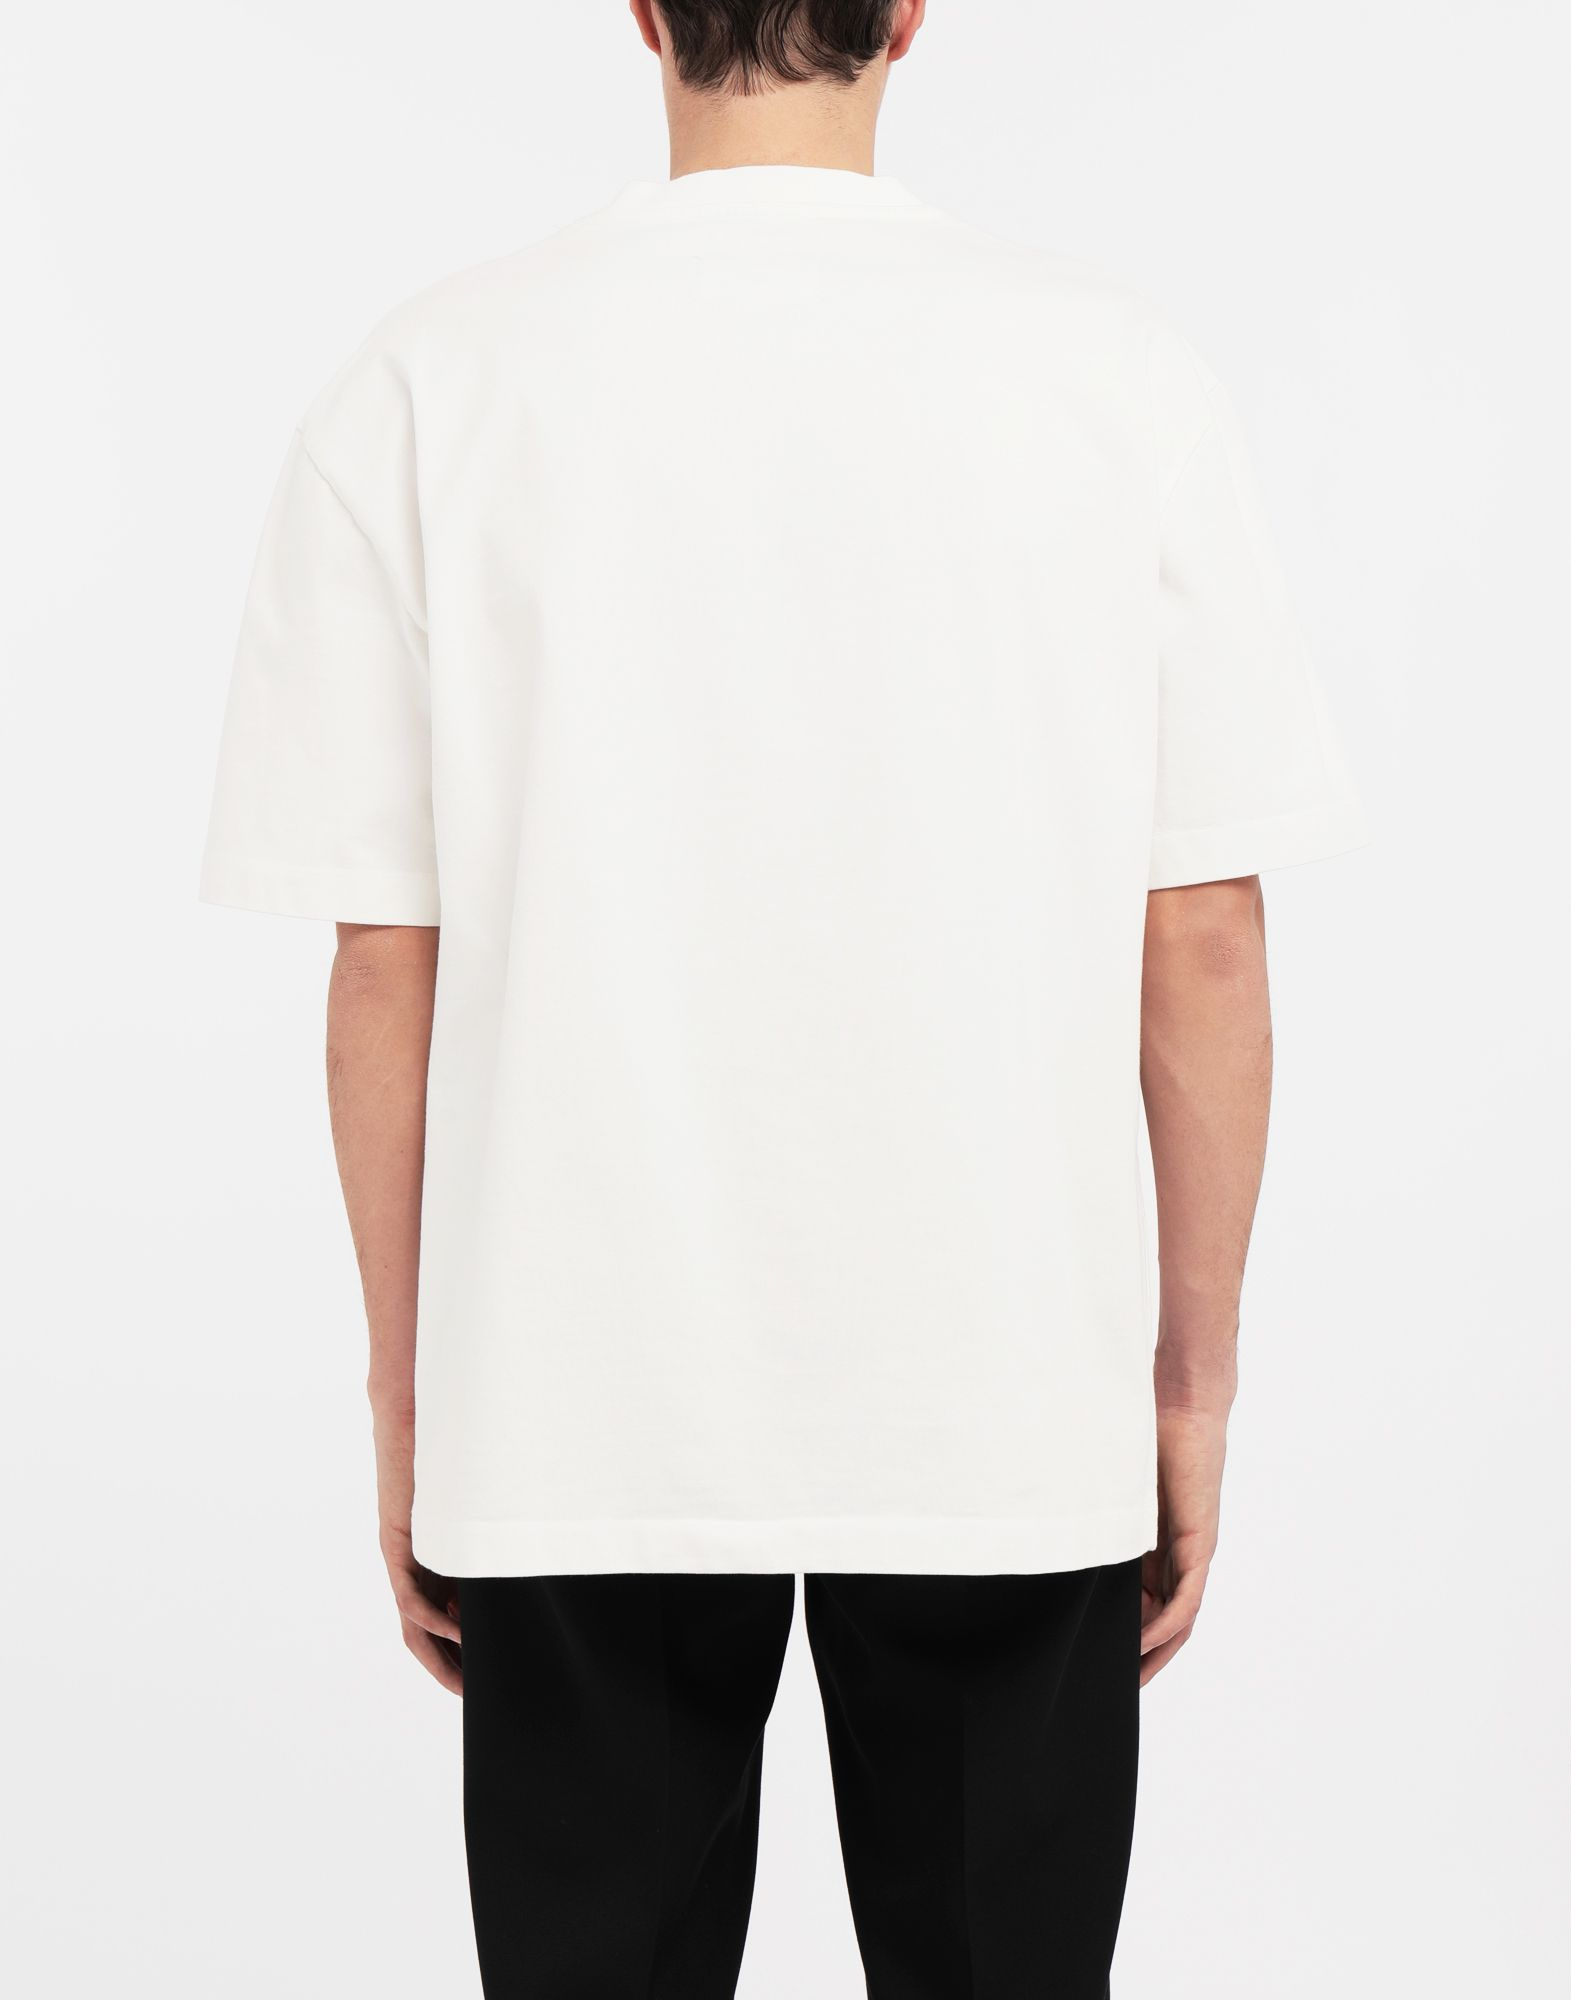 MAISON MARGIELA Graphic print T-shirt Short sleeve t-shirt Man e